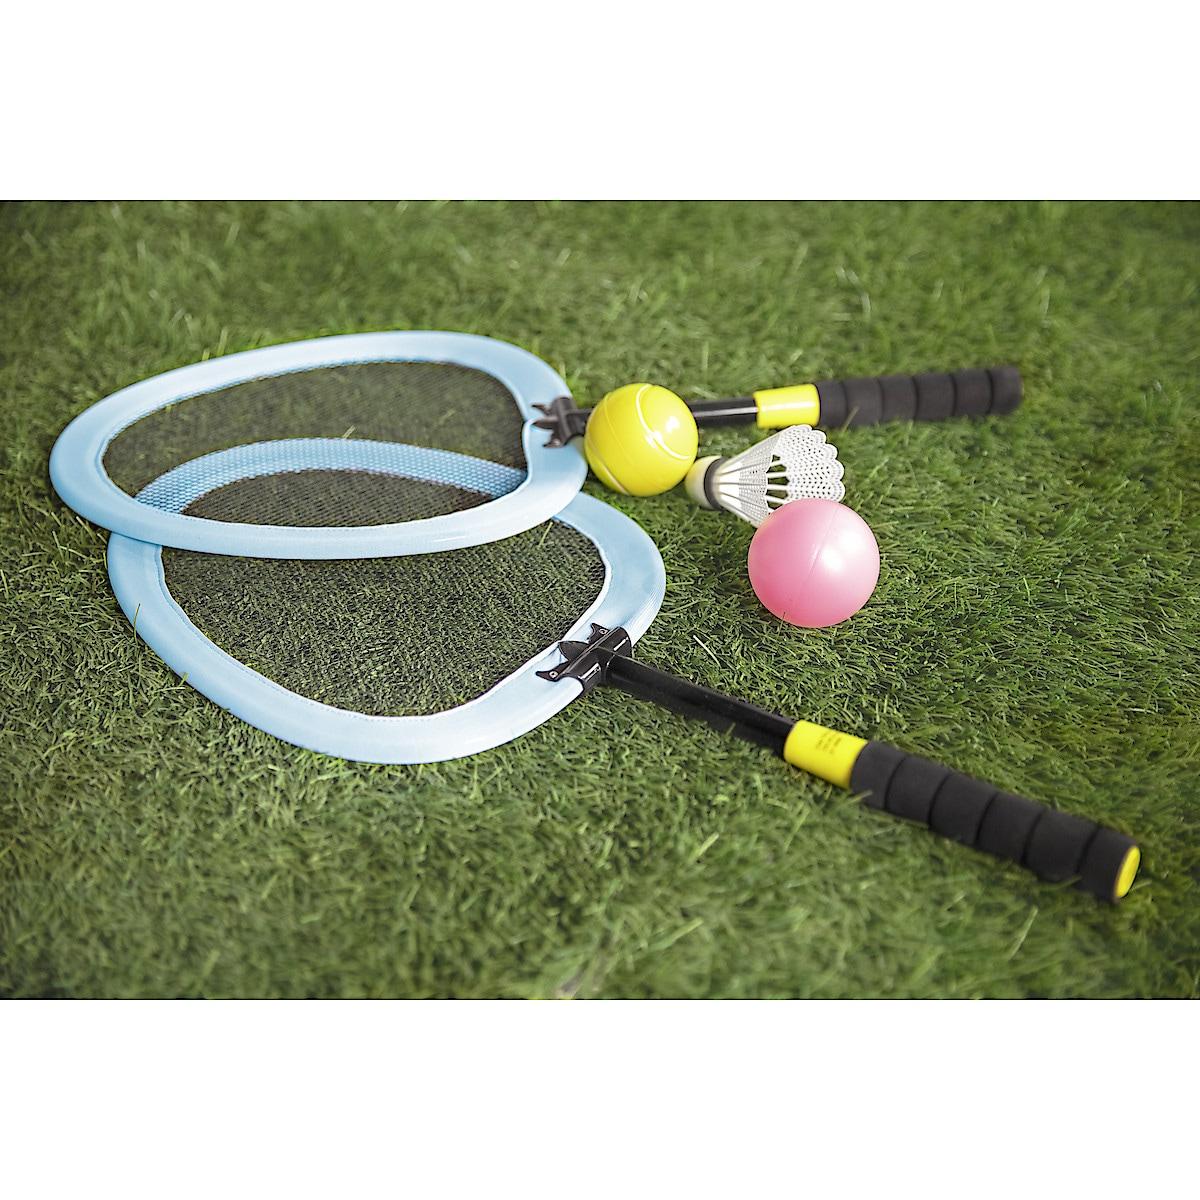 Badminton for barn